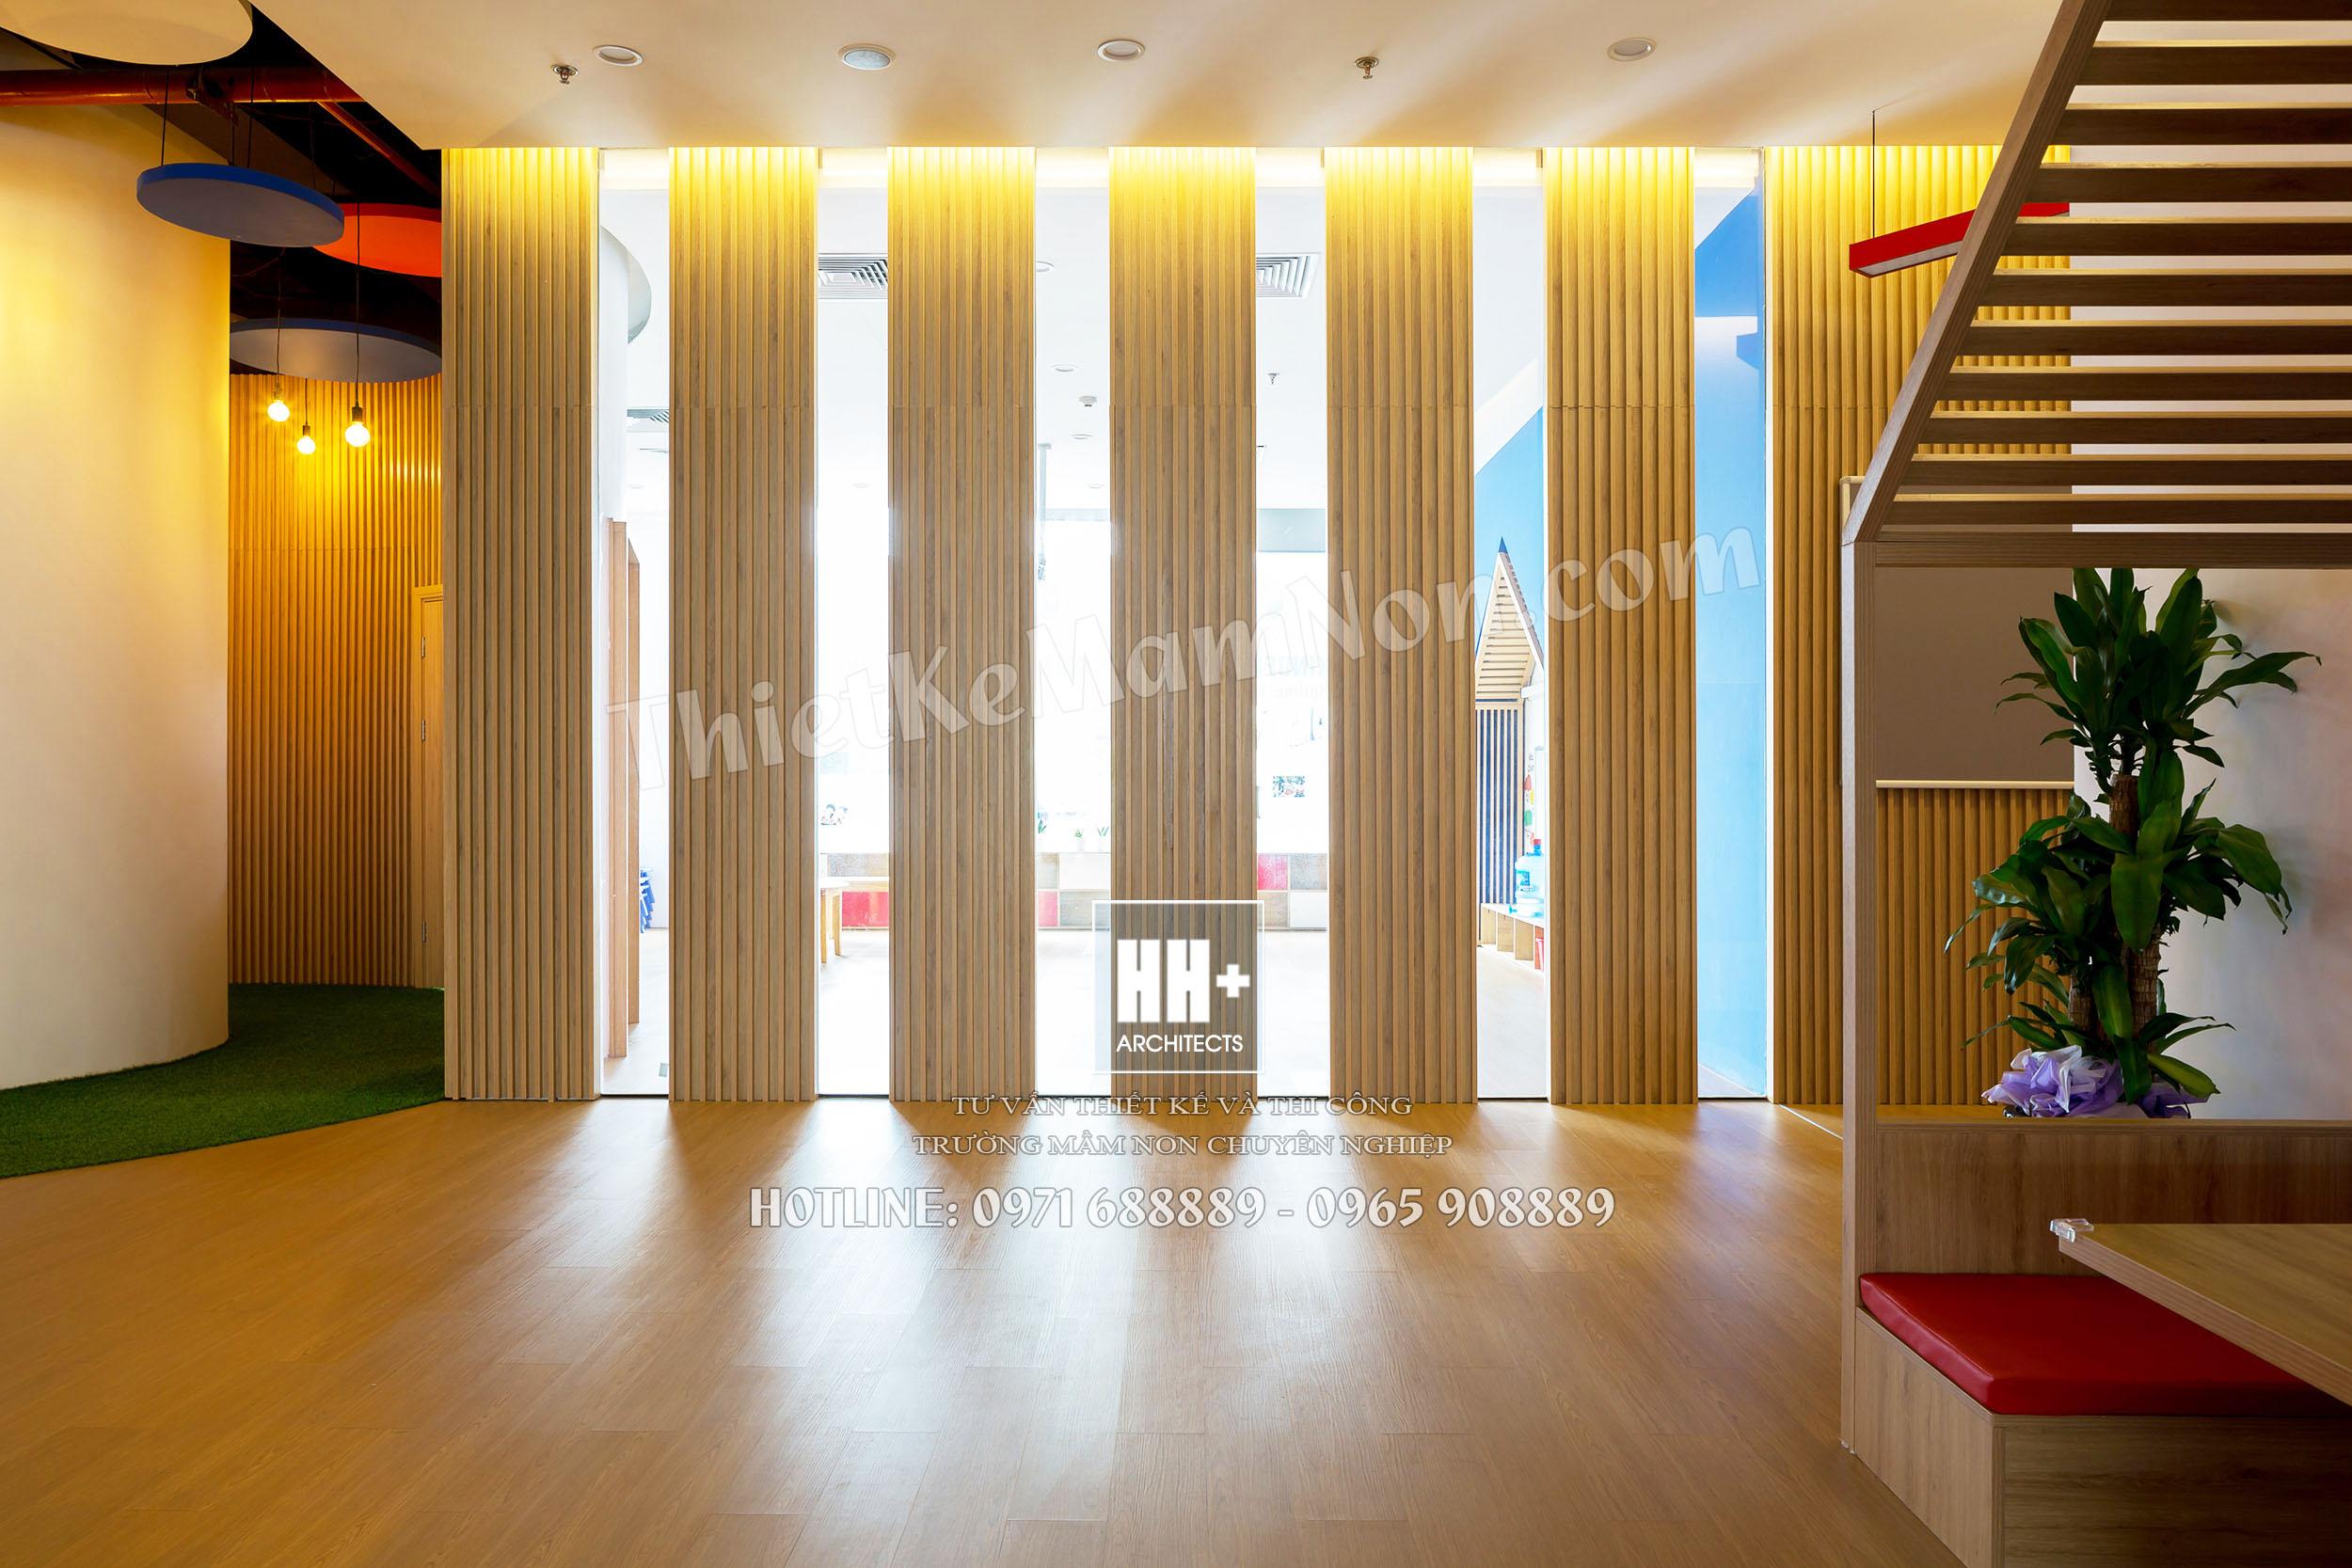 Rosemont_sinhhoatchung_02 thiết kế trường mầm non Thiết kế trường mầm non Quốc Tế MỸ ROSEMONT Rosemont sinhhoatchung 02